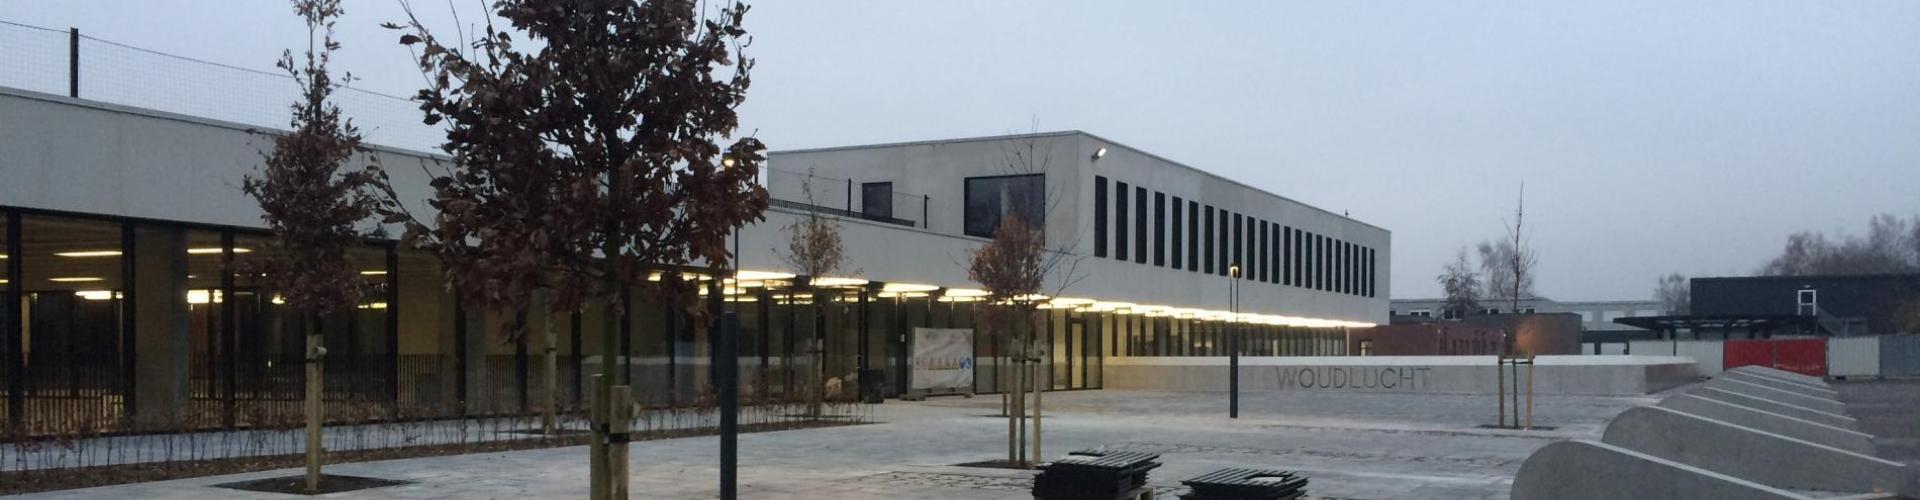 Campus Woudlucht Heverlee